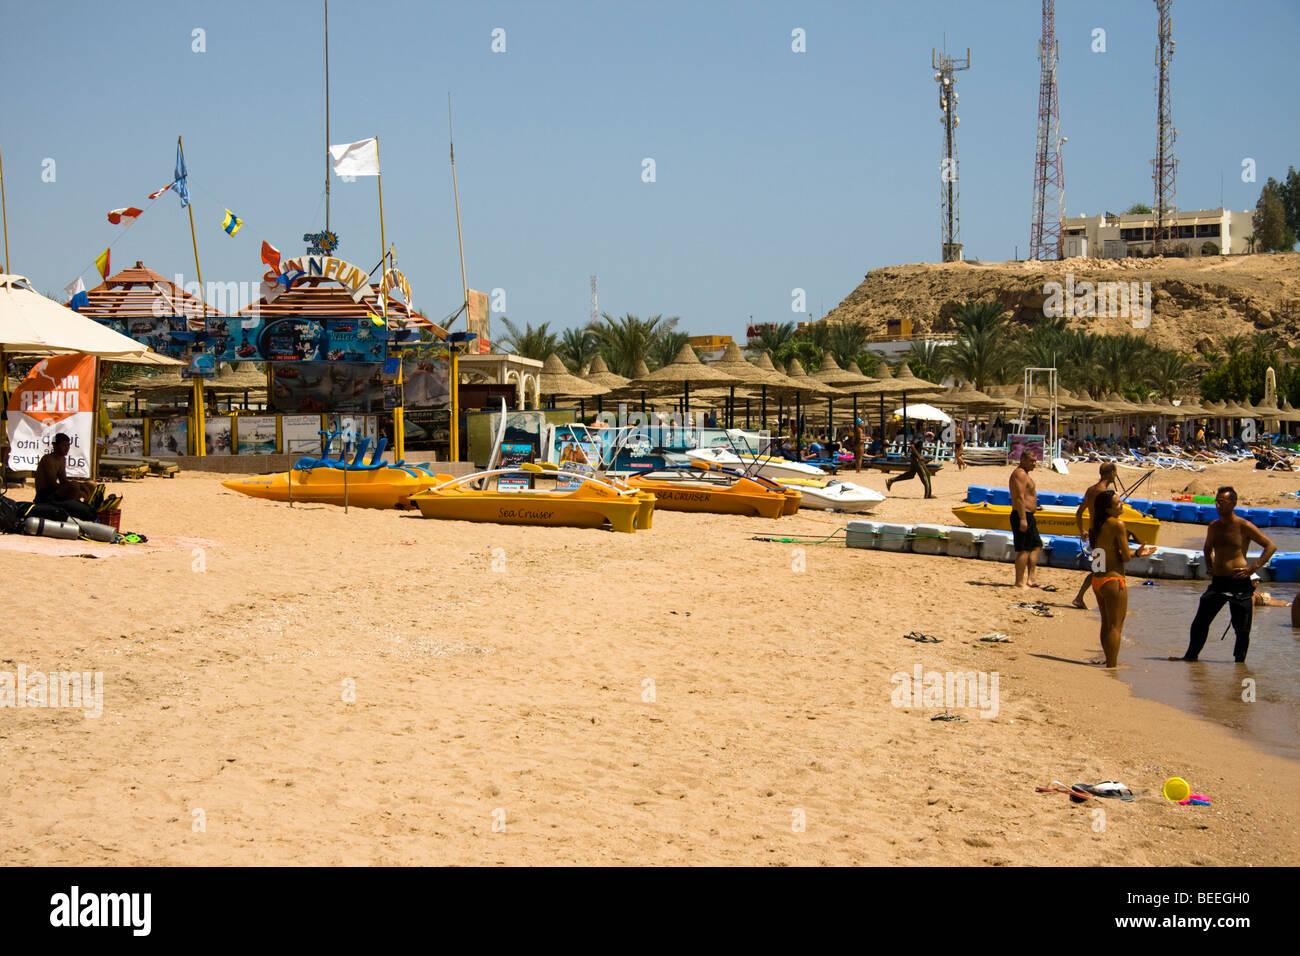 Tourists enjoying the sun at Naama Bay beach, Sharm el Sheikh, Red Sea, Egypt - Stock Image